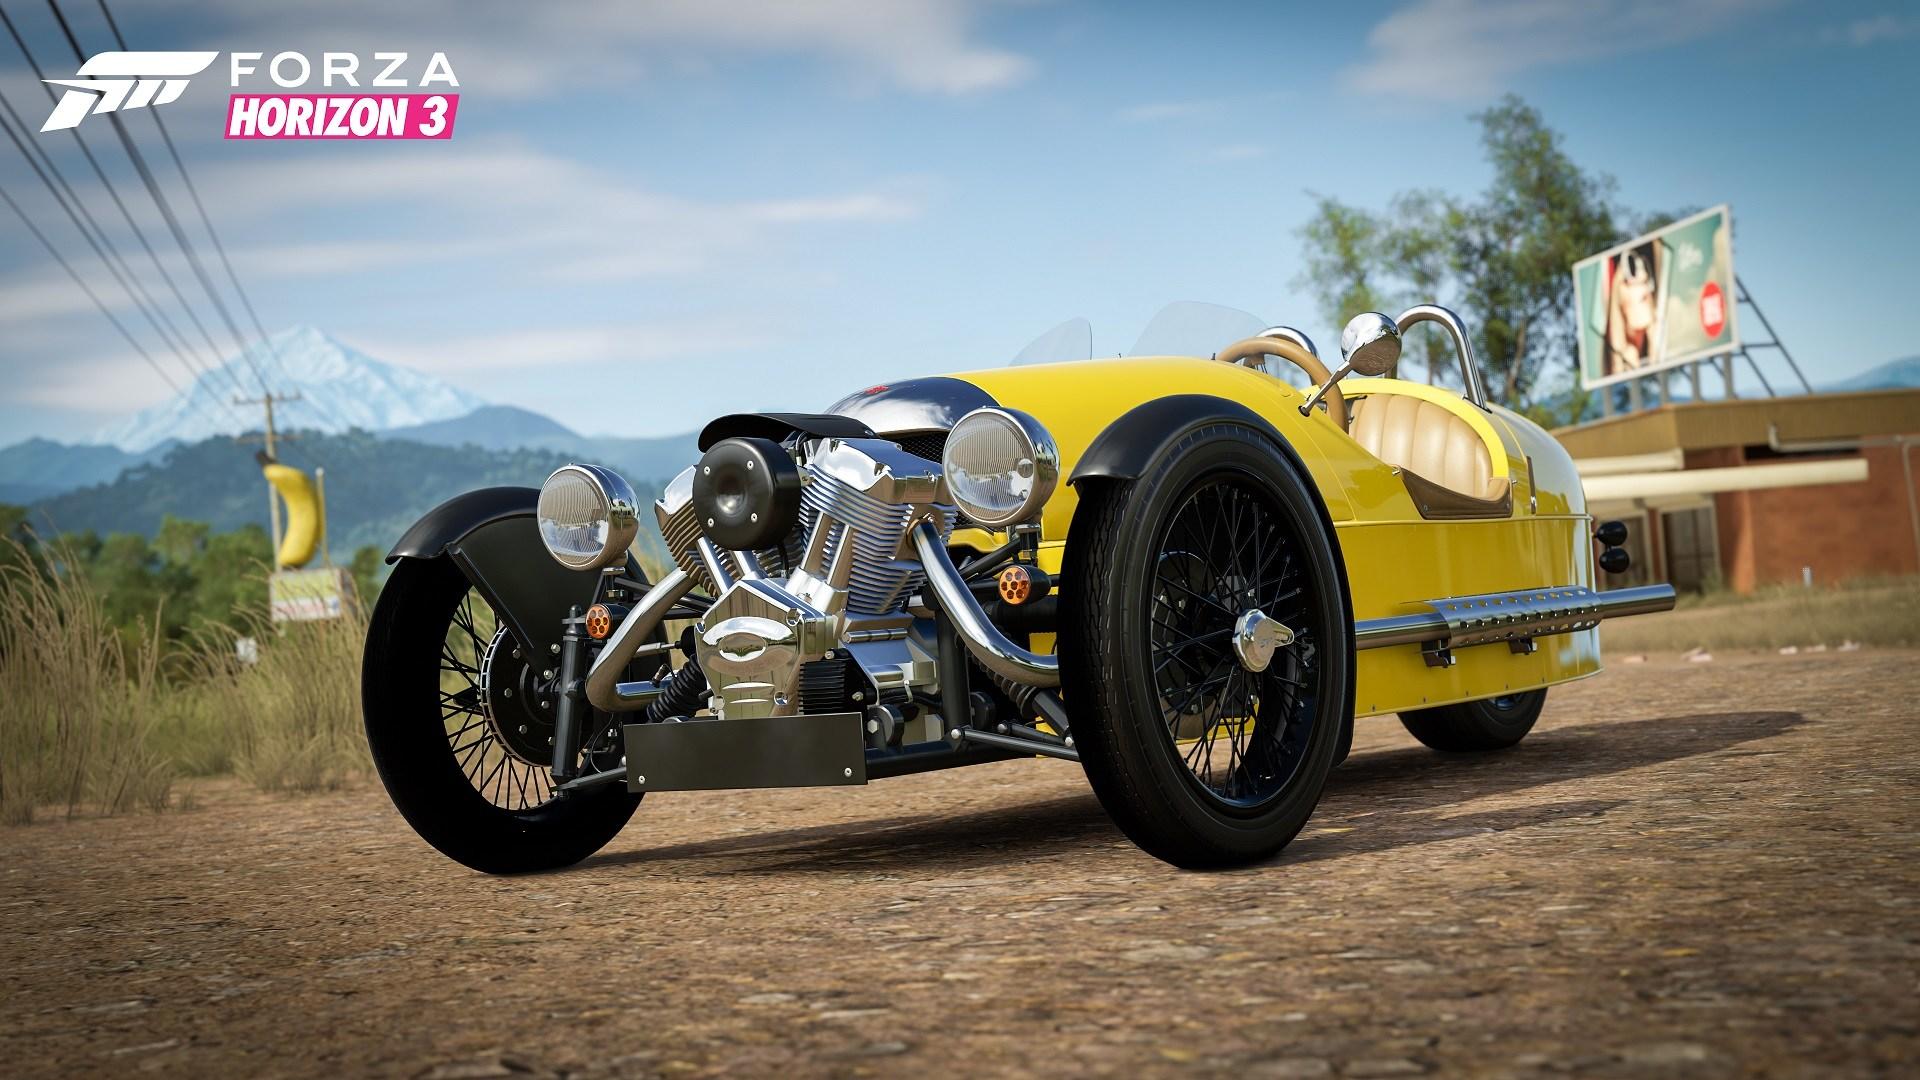 Morgan Wheeler Forza Motorsport Wiki FANDOM Powered By Wikia - Cool cars in forza horizon 3